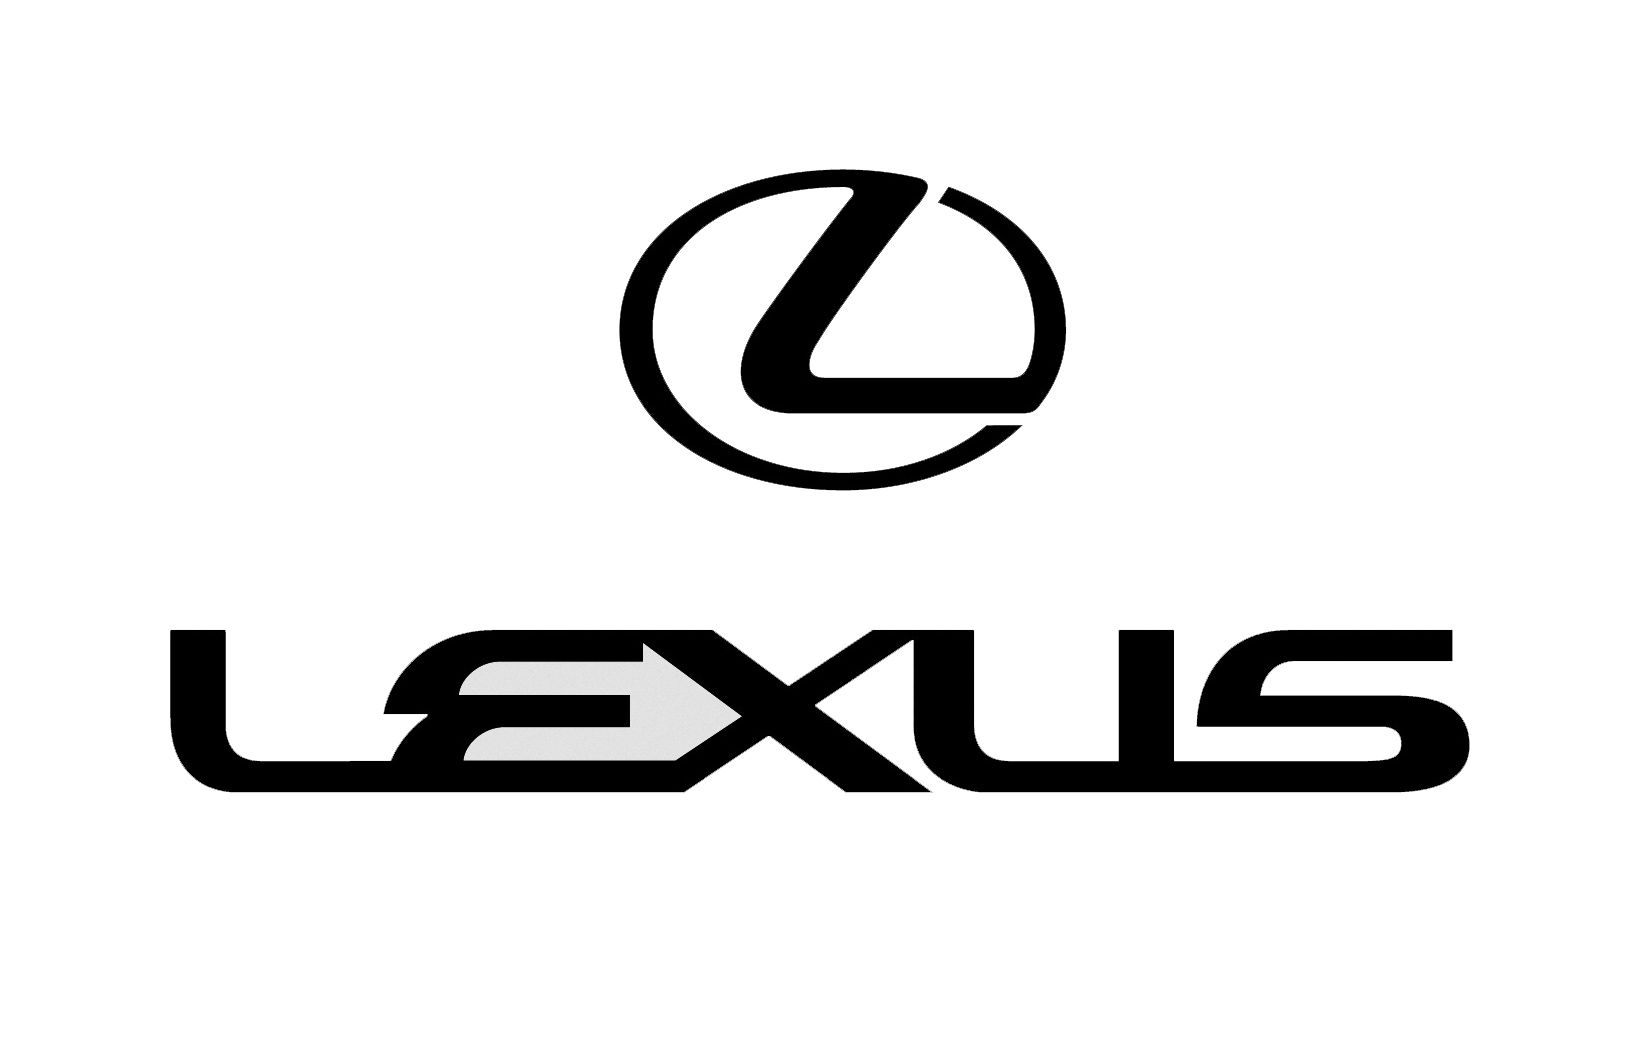 Lexus is logo httpcarsymbolslexus is logo car symbols lexus is logo httpcarsymbolslexus is biocorpaavc Gallery